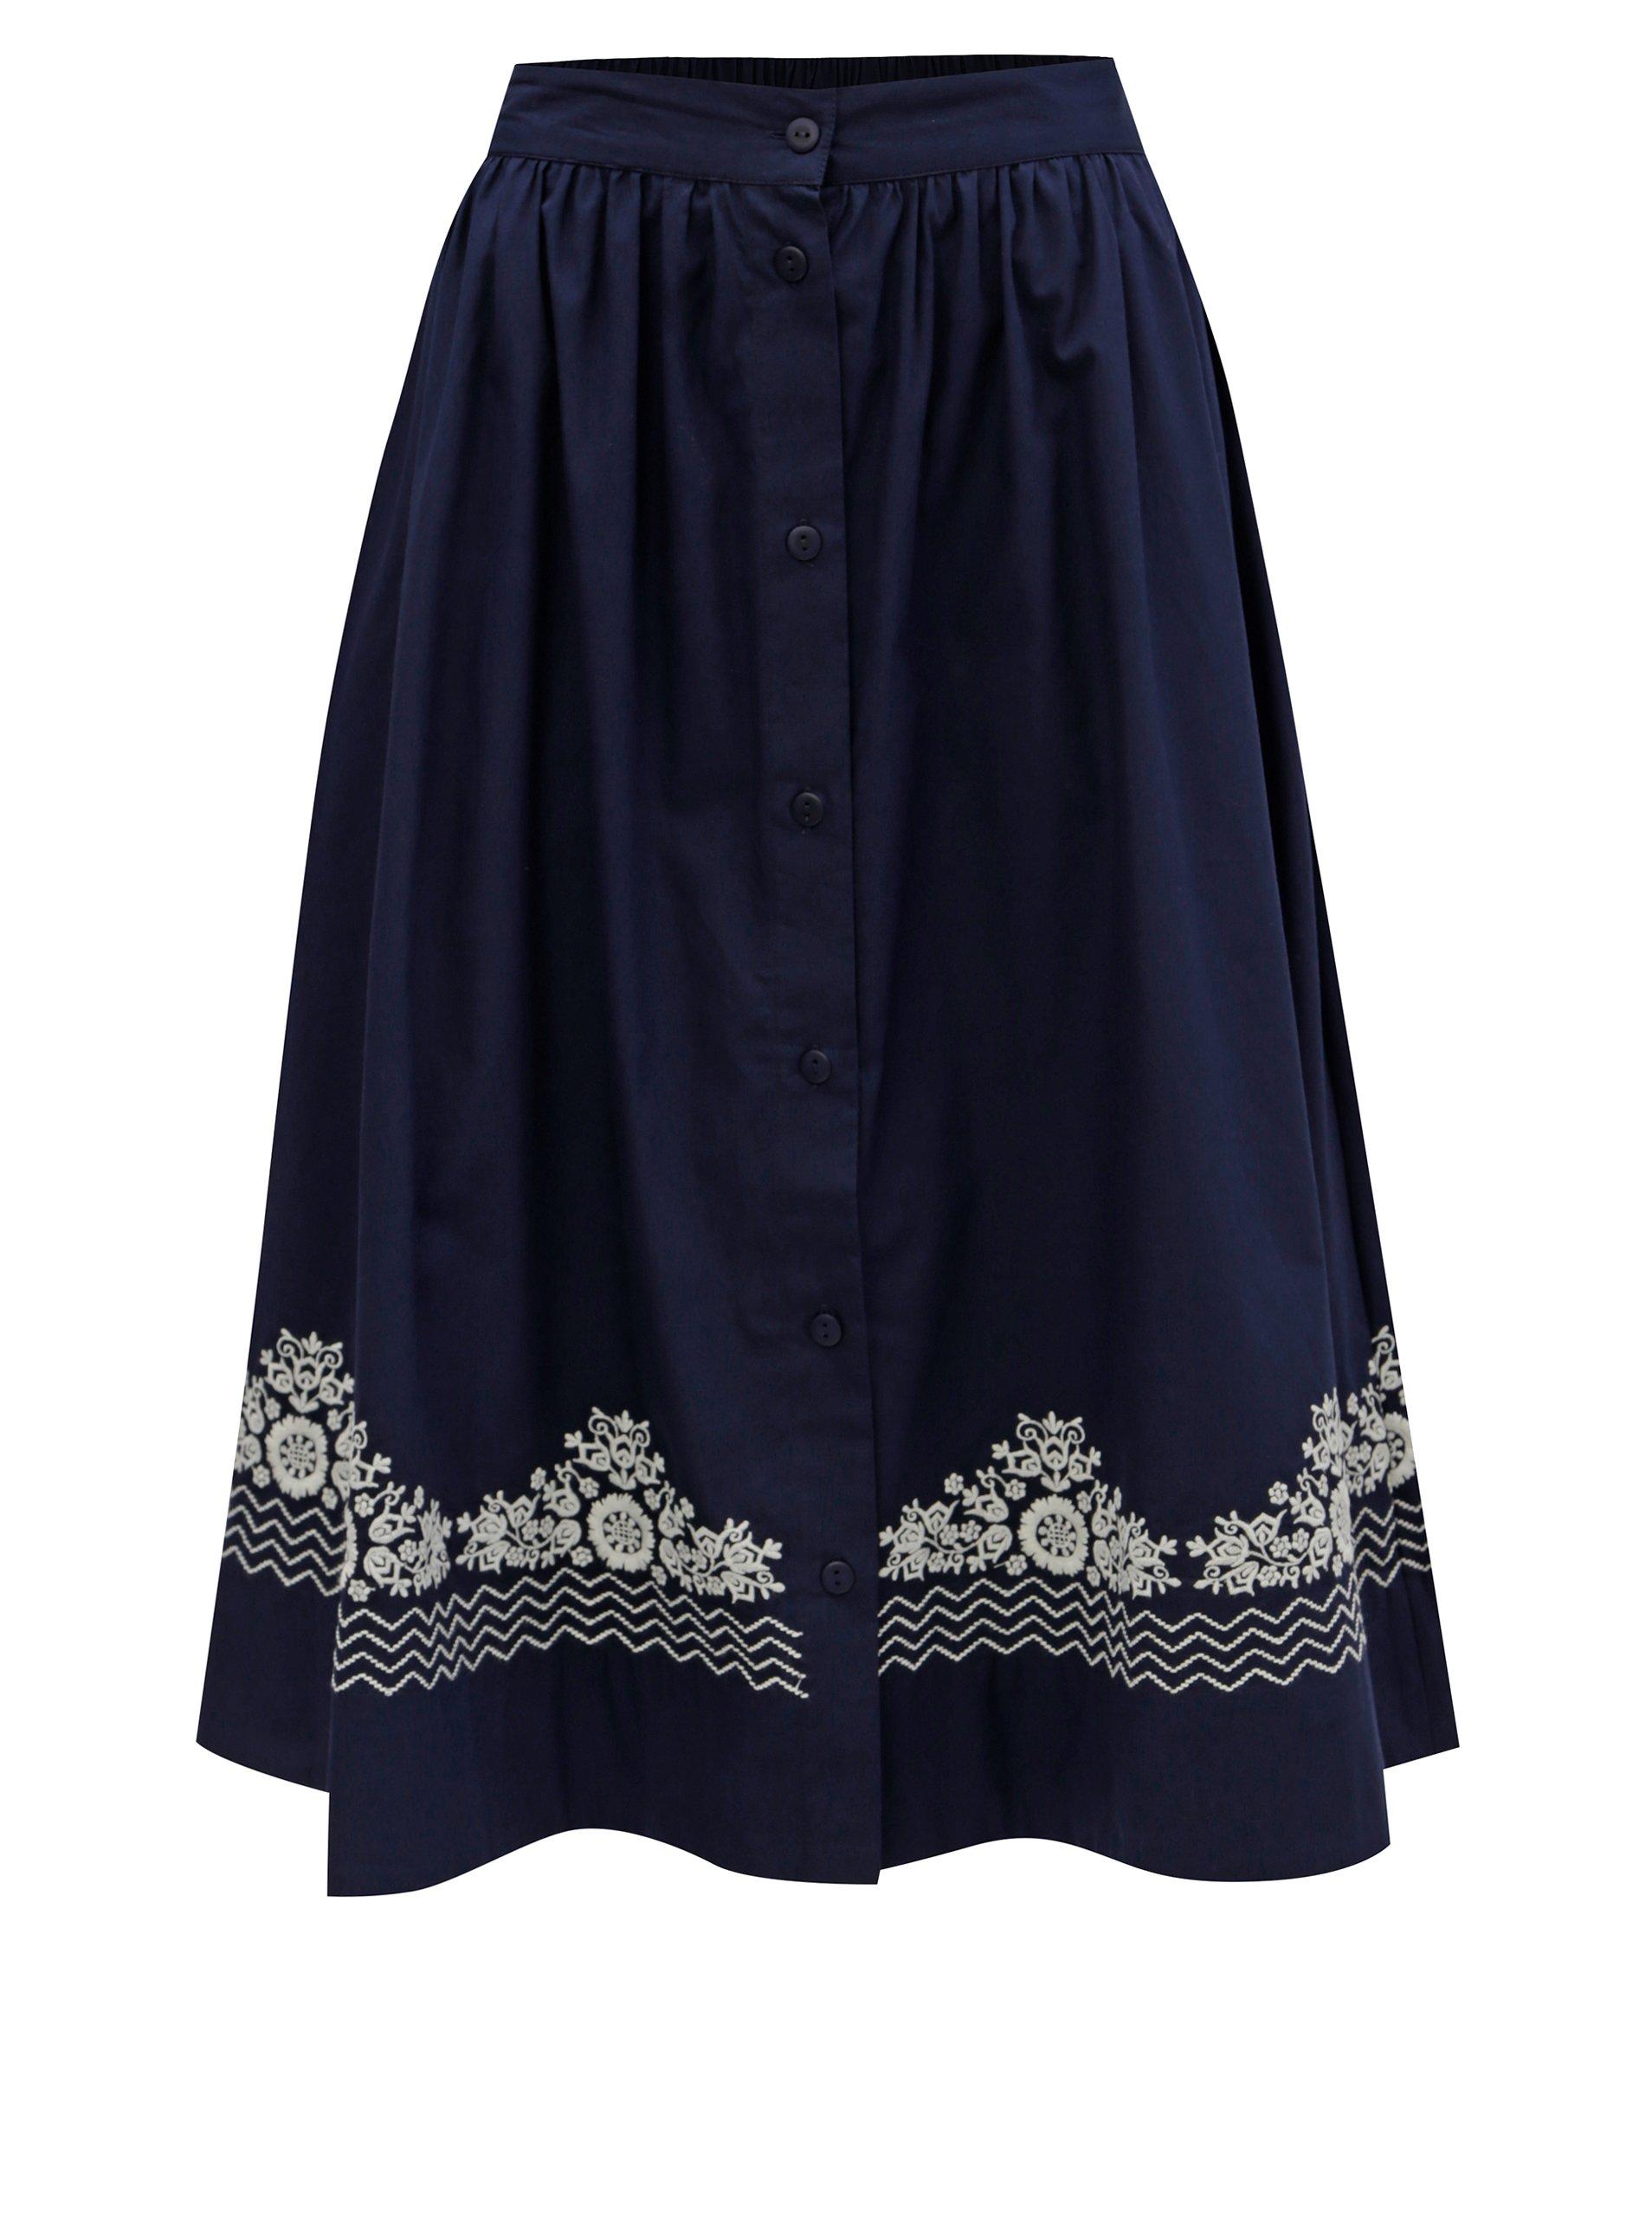 245dd8131 Tmavomodrá sukňa s gombíkmi a výšivkou French Connection Rhodea ...